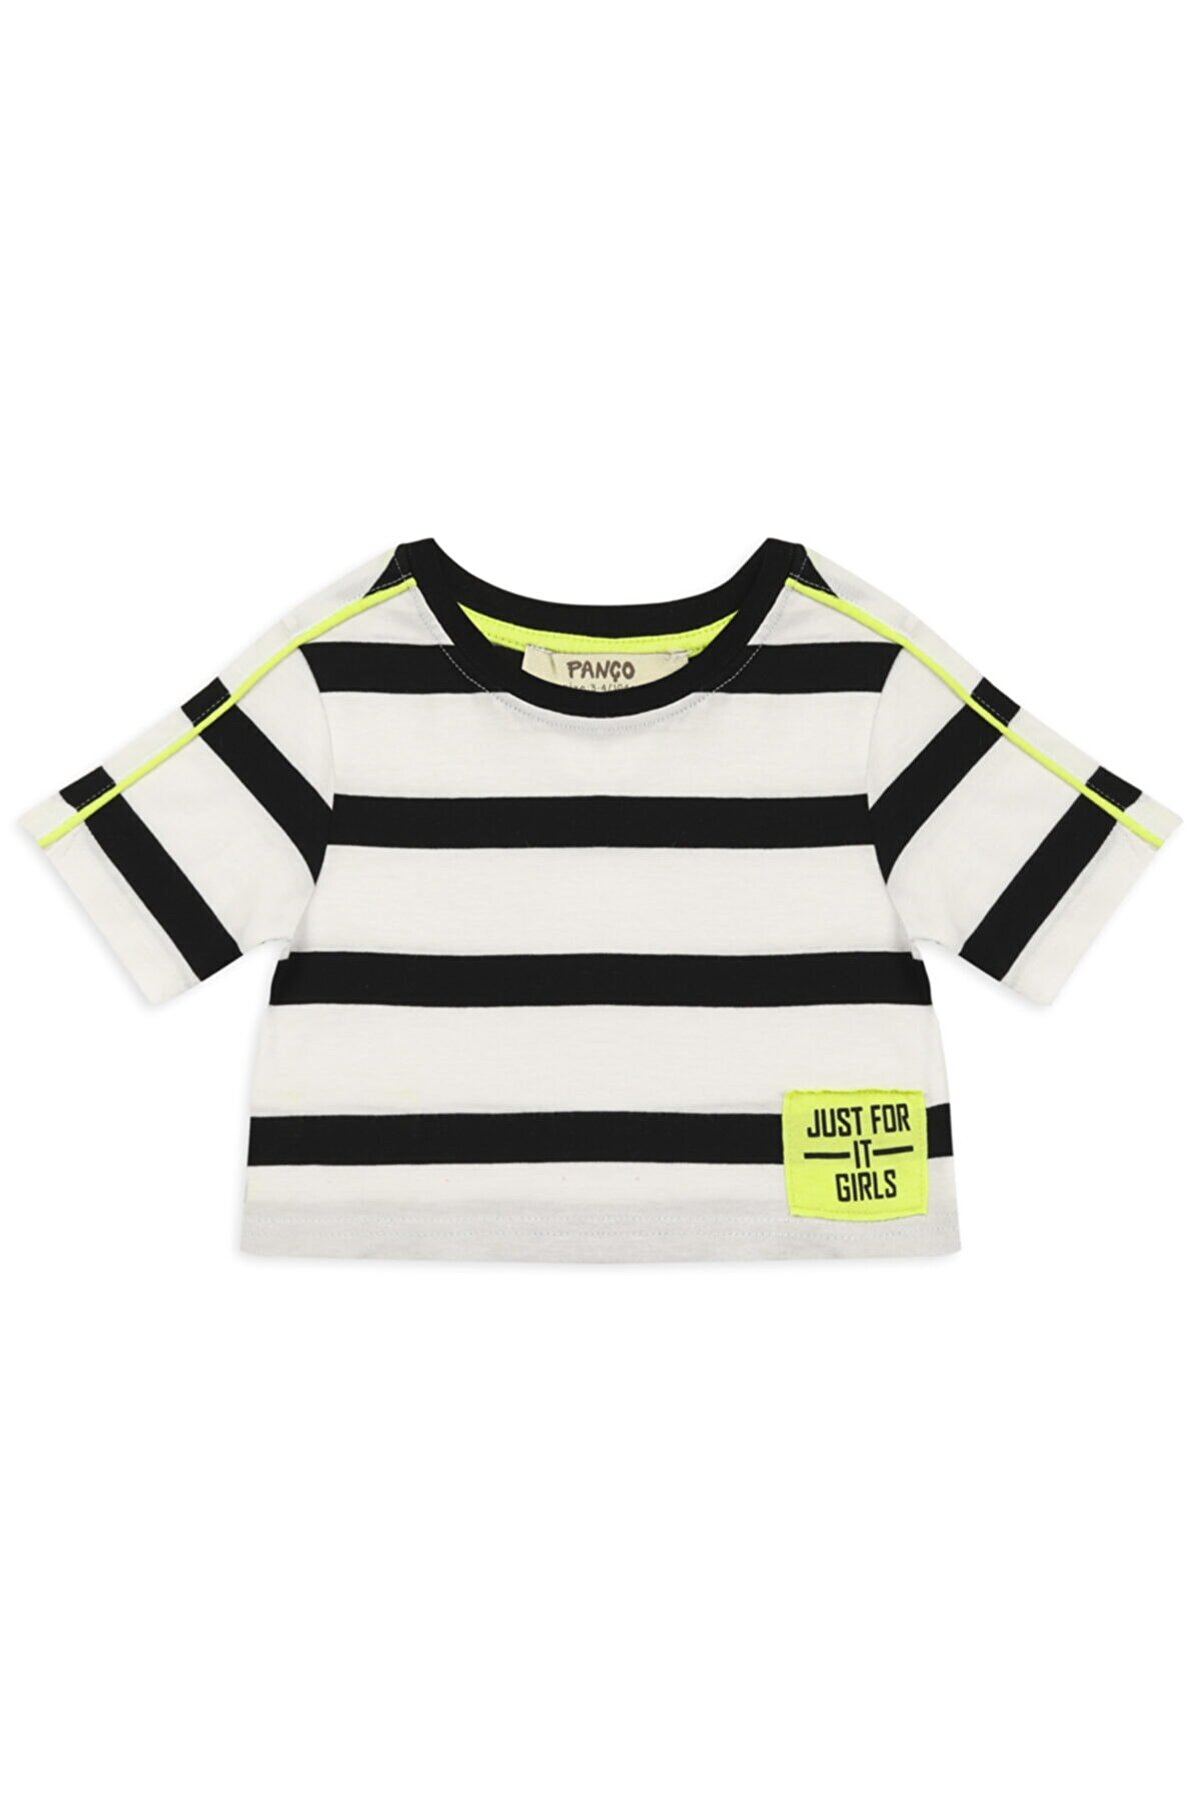 Panço Kız Çocuk Kırmızı T-shirt 2111gk05003